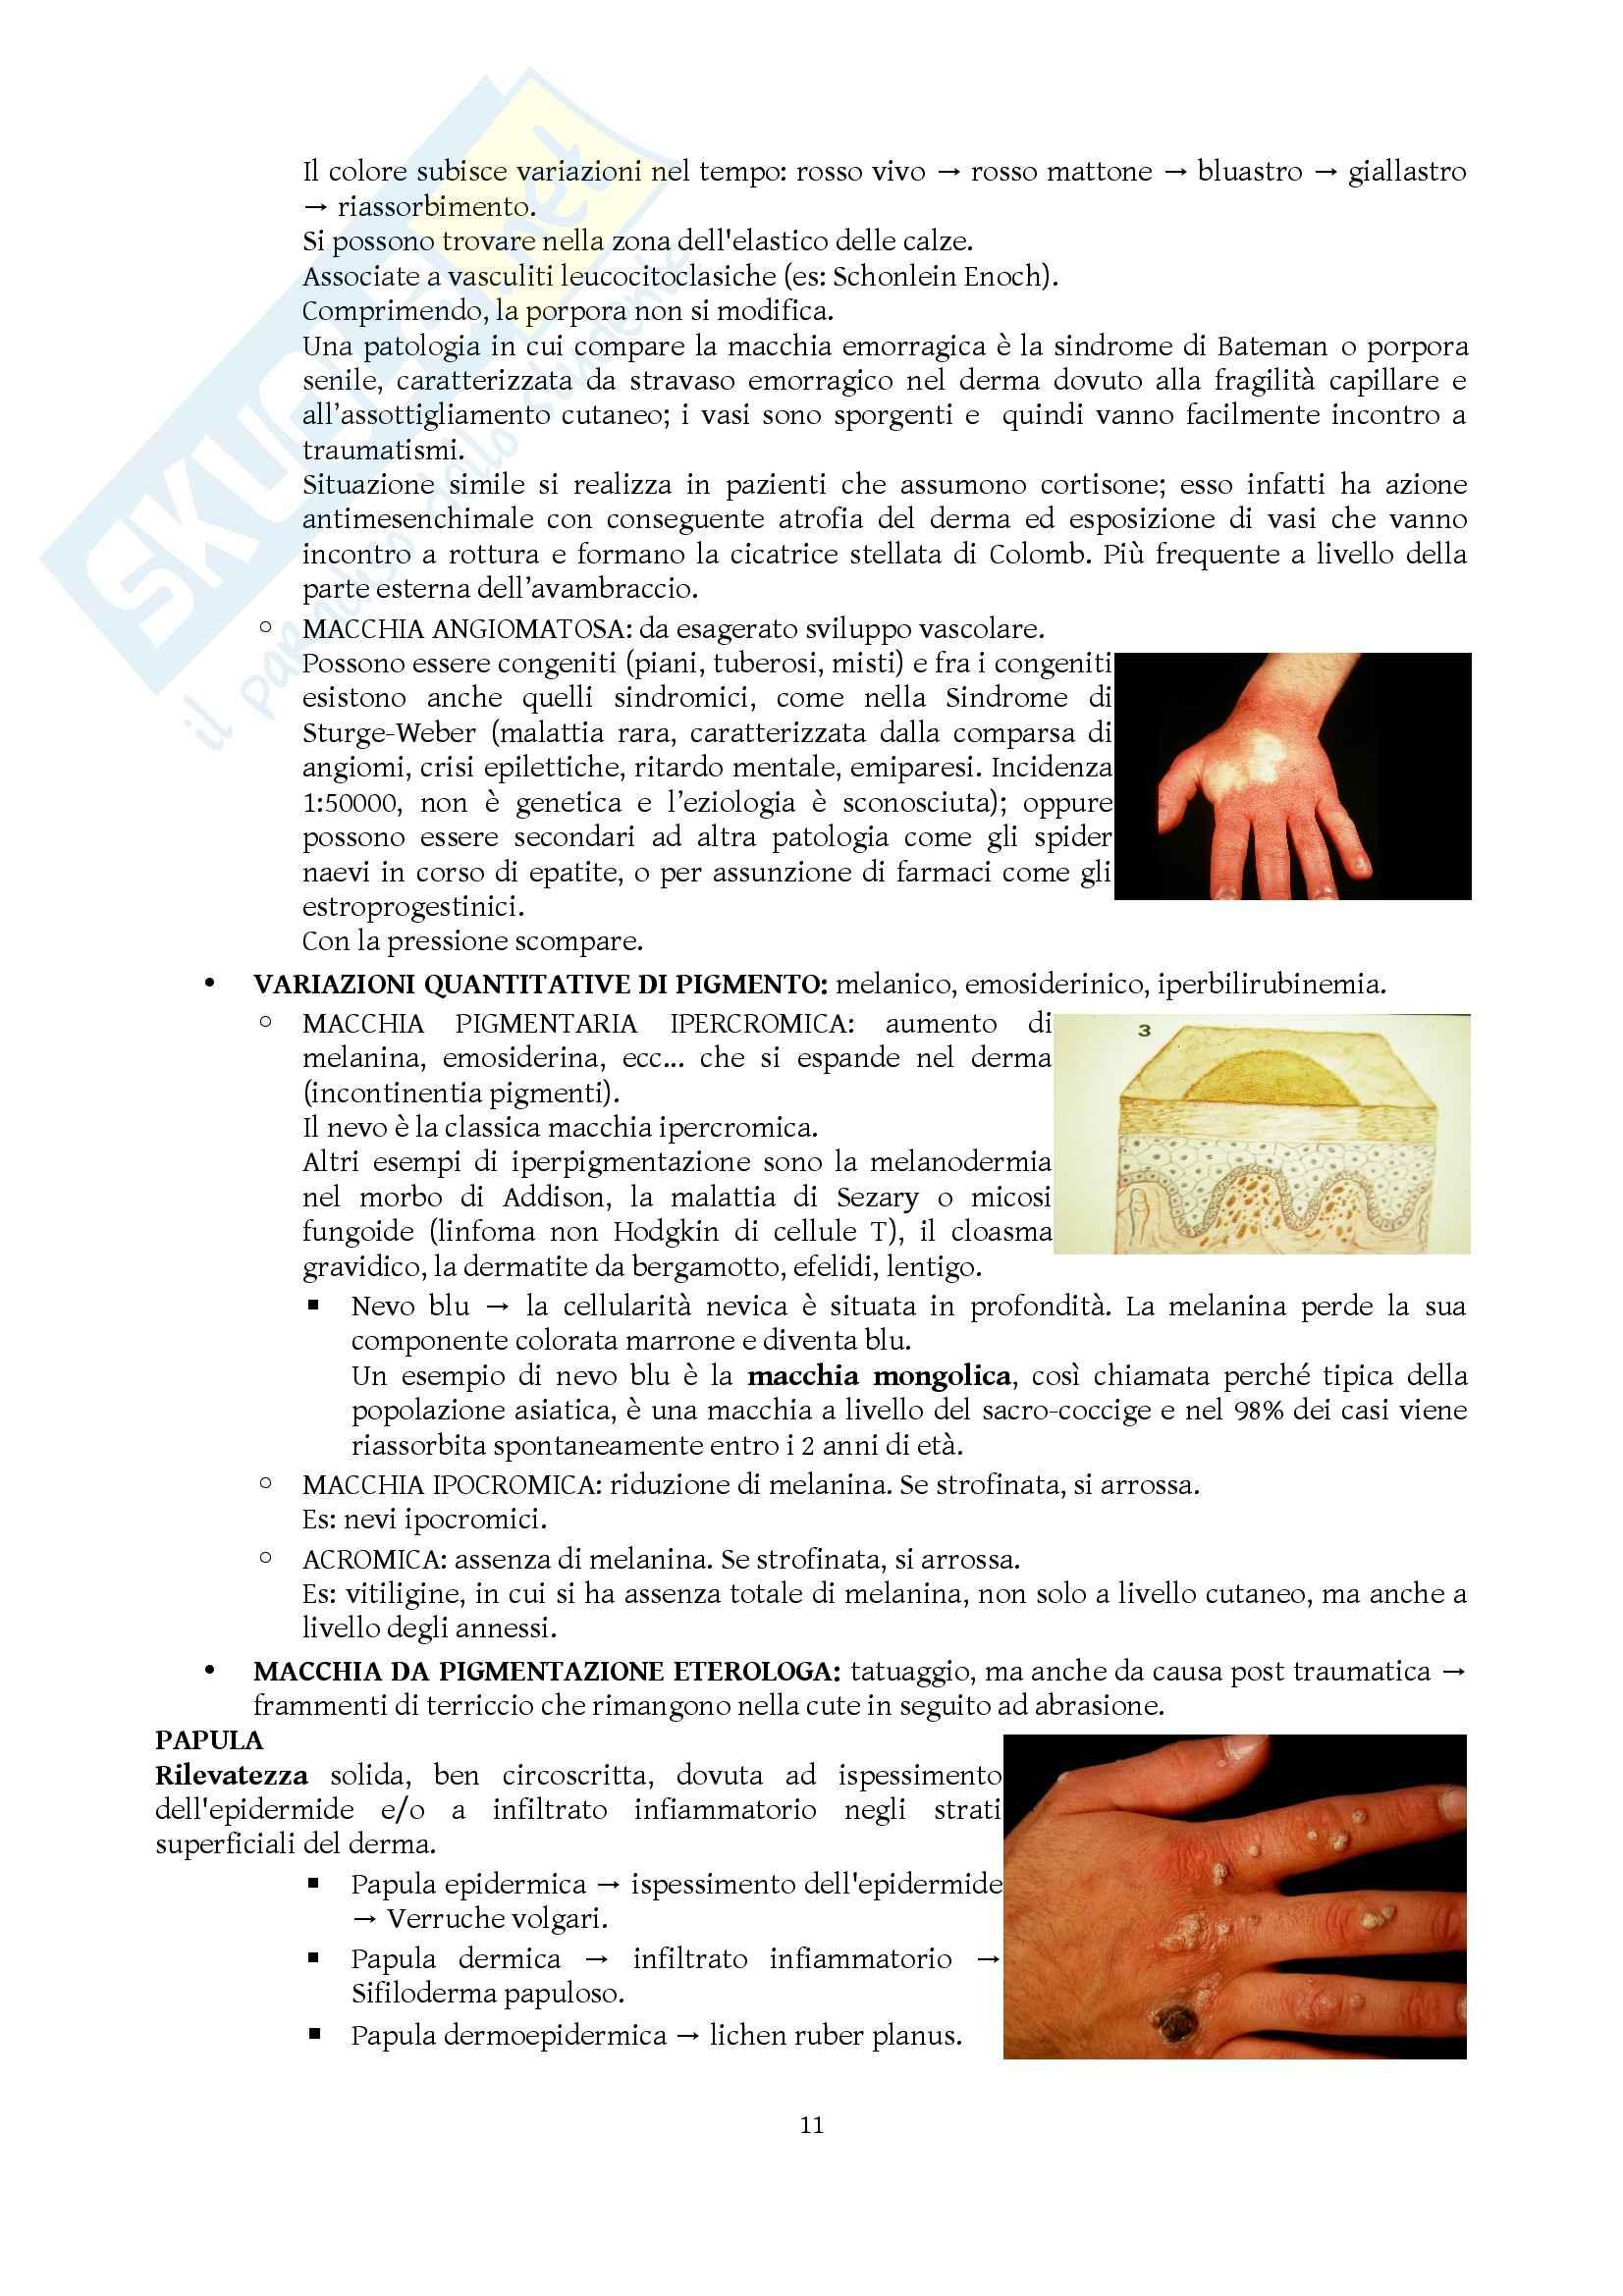 Dermatologia e Venereologia - Appunti Pag. 11